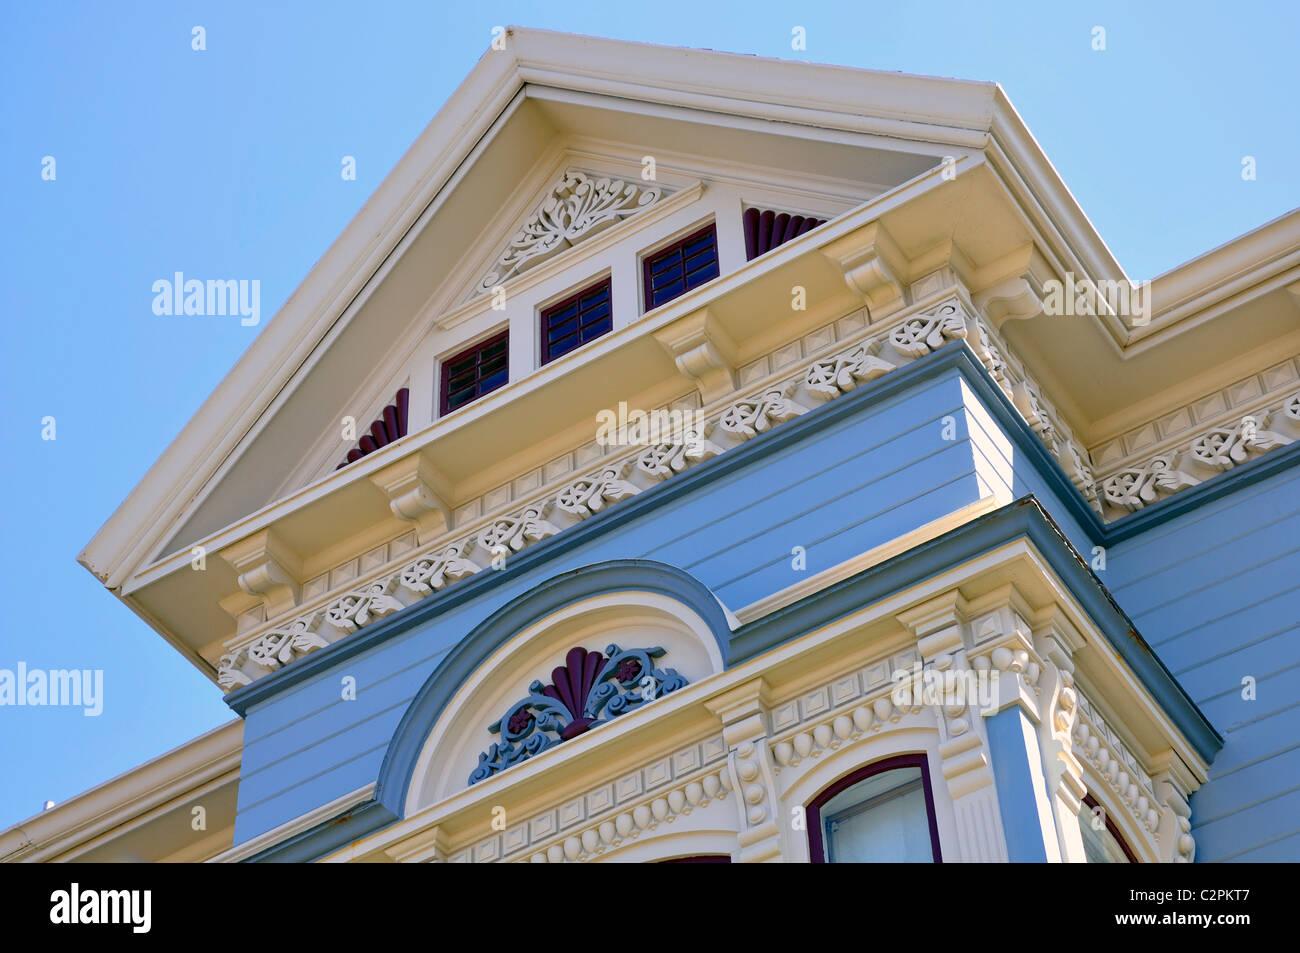 Victorian house, Eureka, California, USA - Stock Image